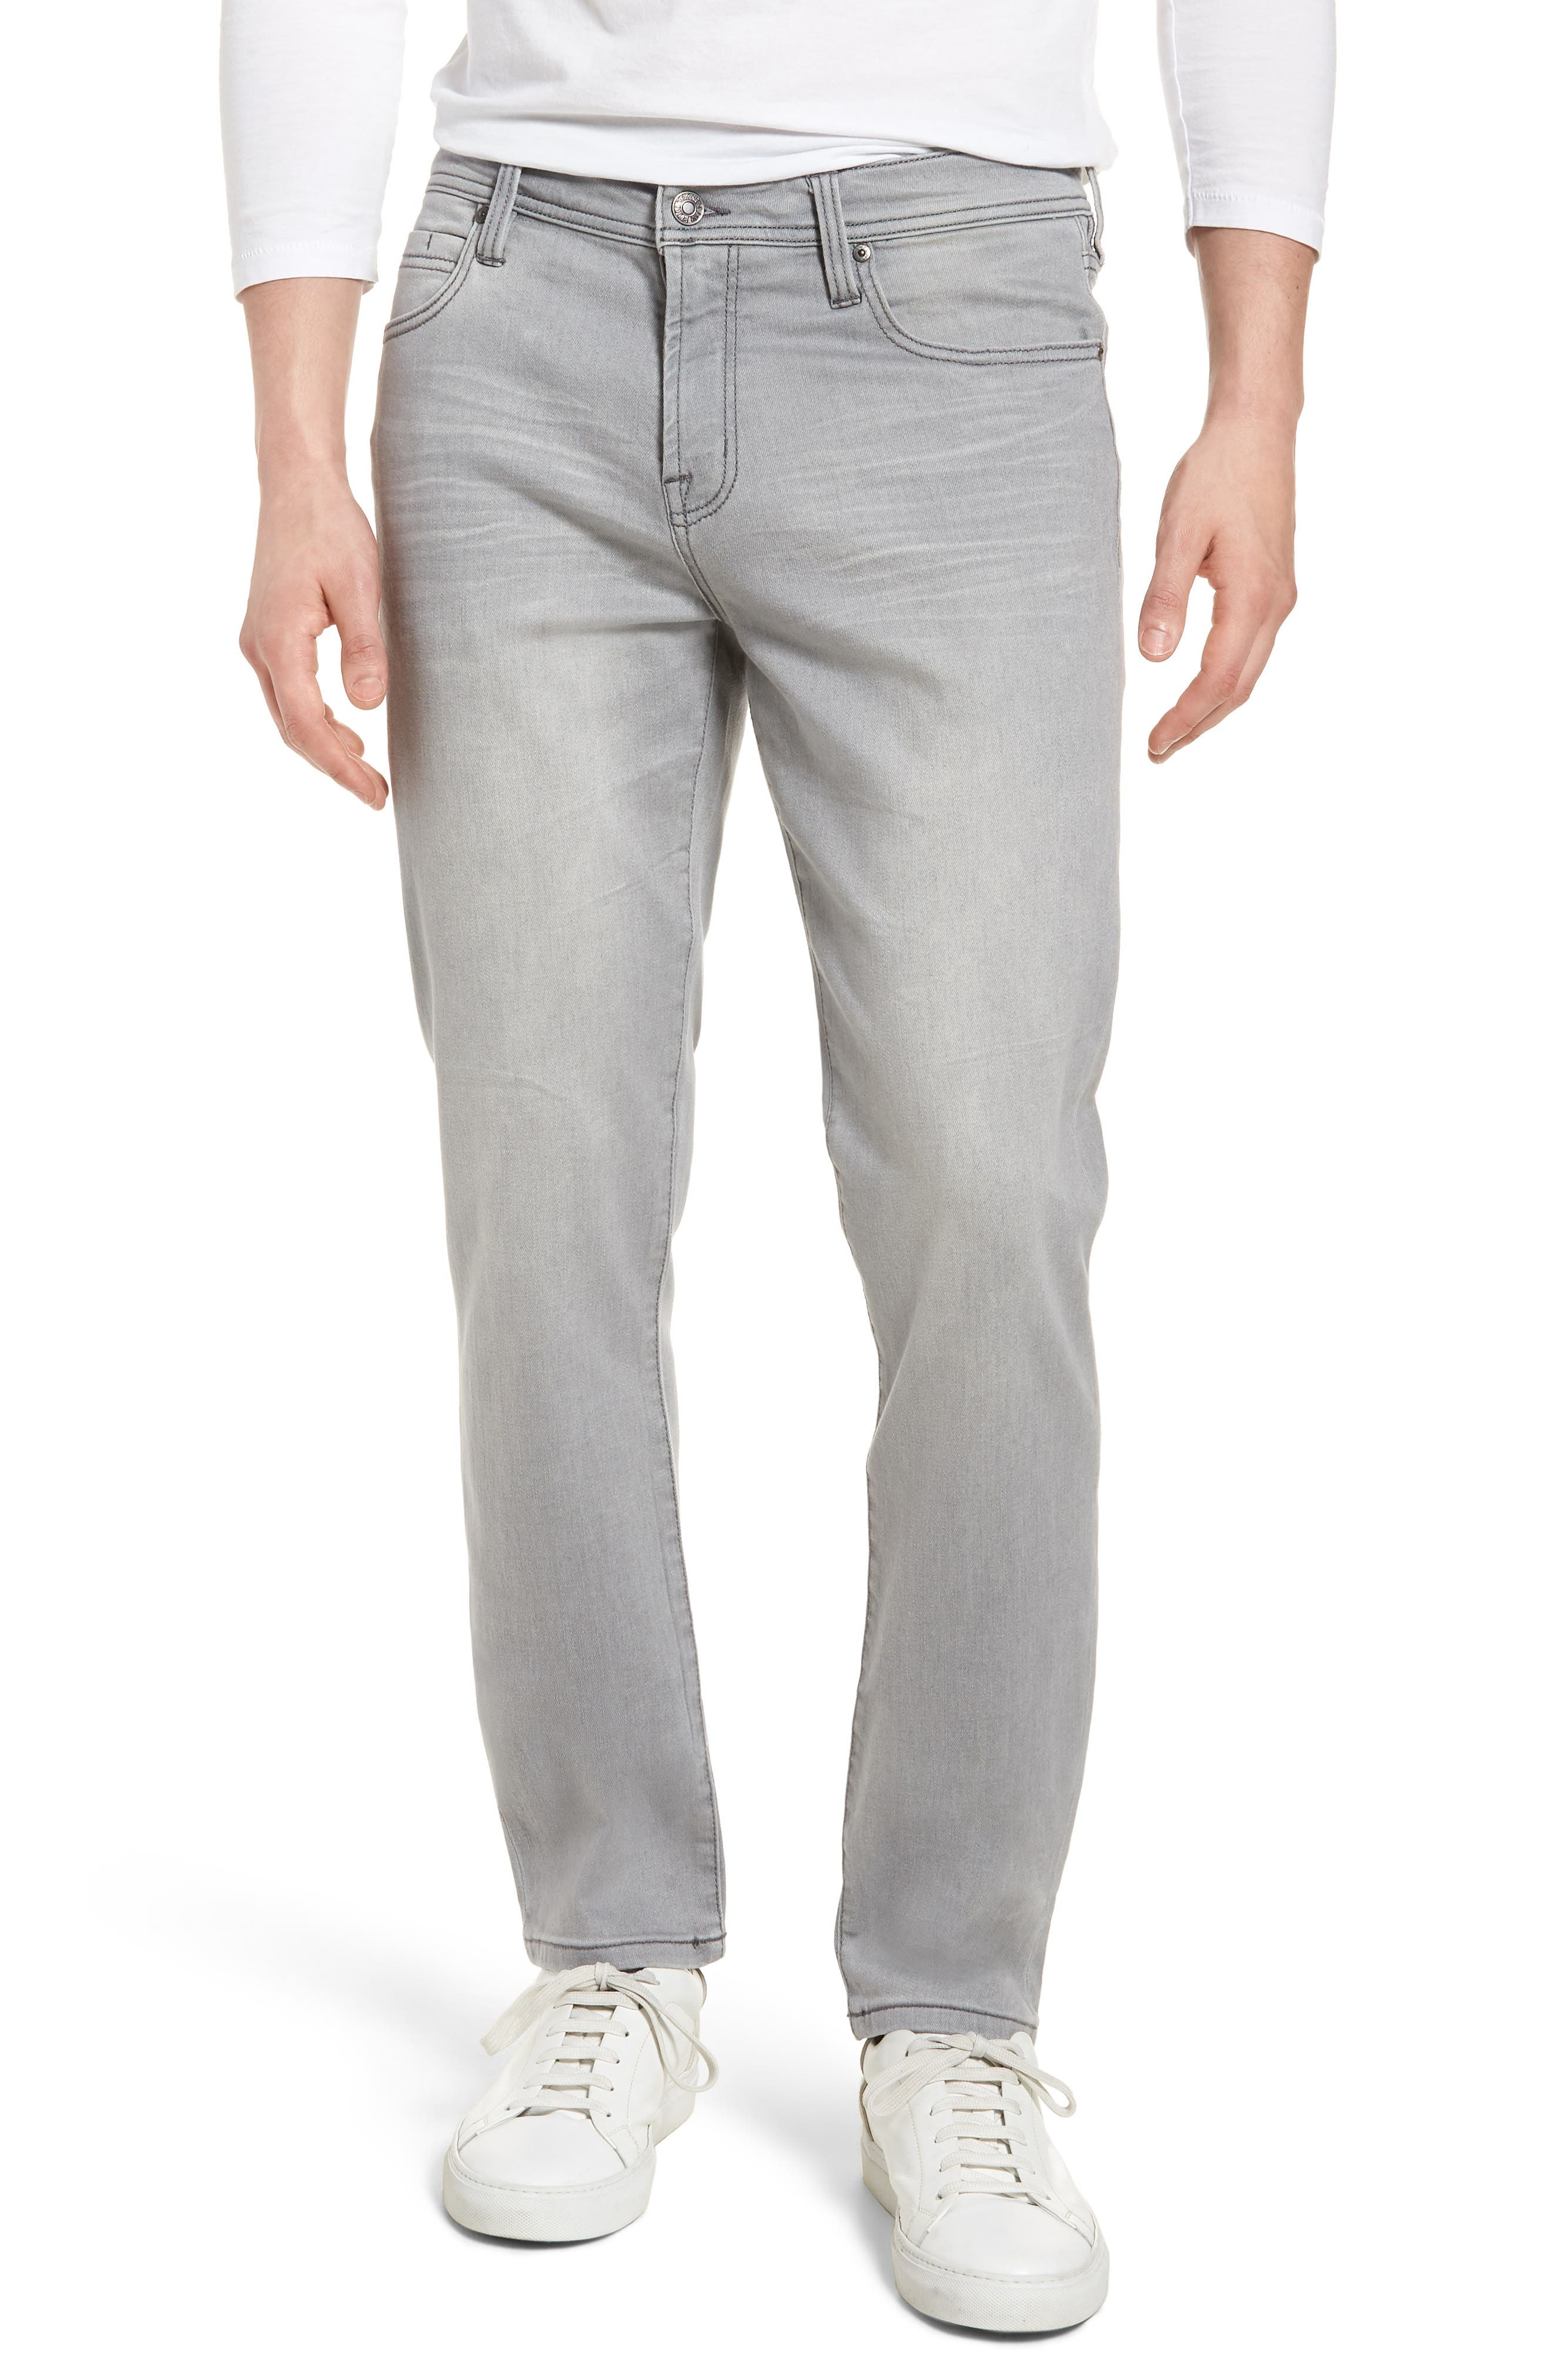 Jeans Co. Kingston Slim Straight Leg Jeans,                         Main,                         color, Coal Mine Dark